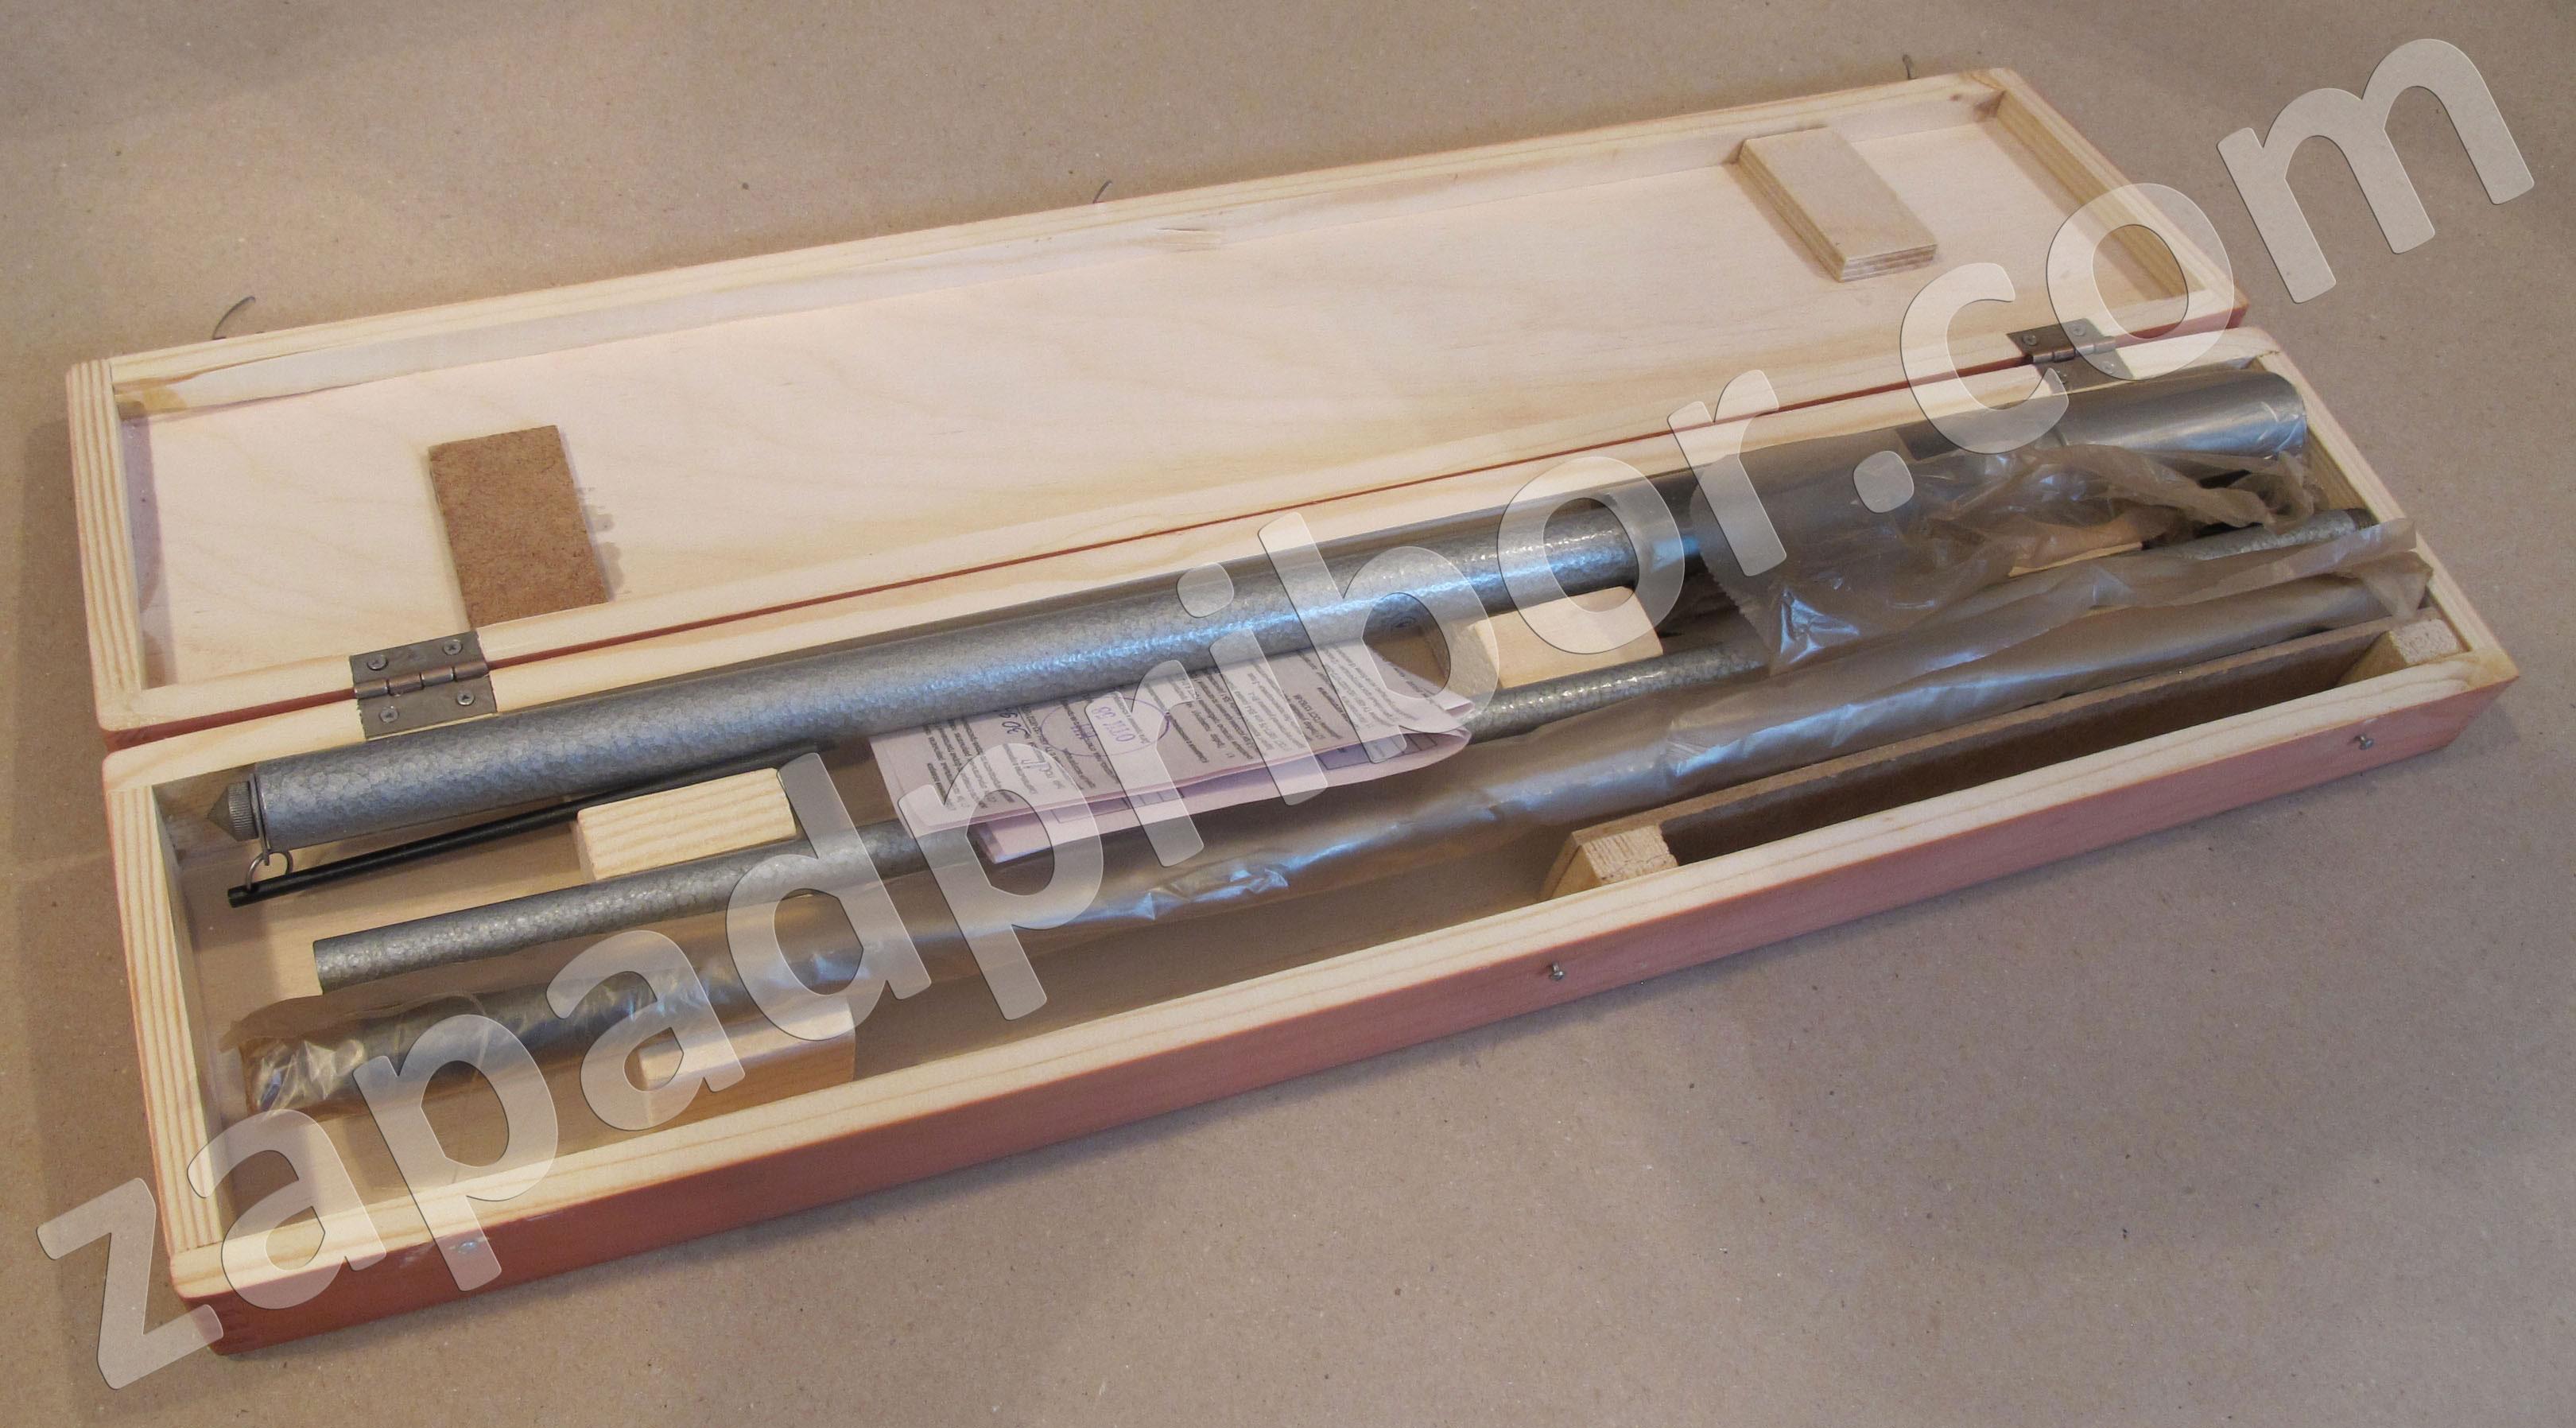 СКЗ - Кристалл-2 Ду32 НД (СН+СО) система контроля загазованности